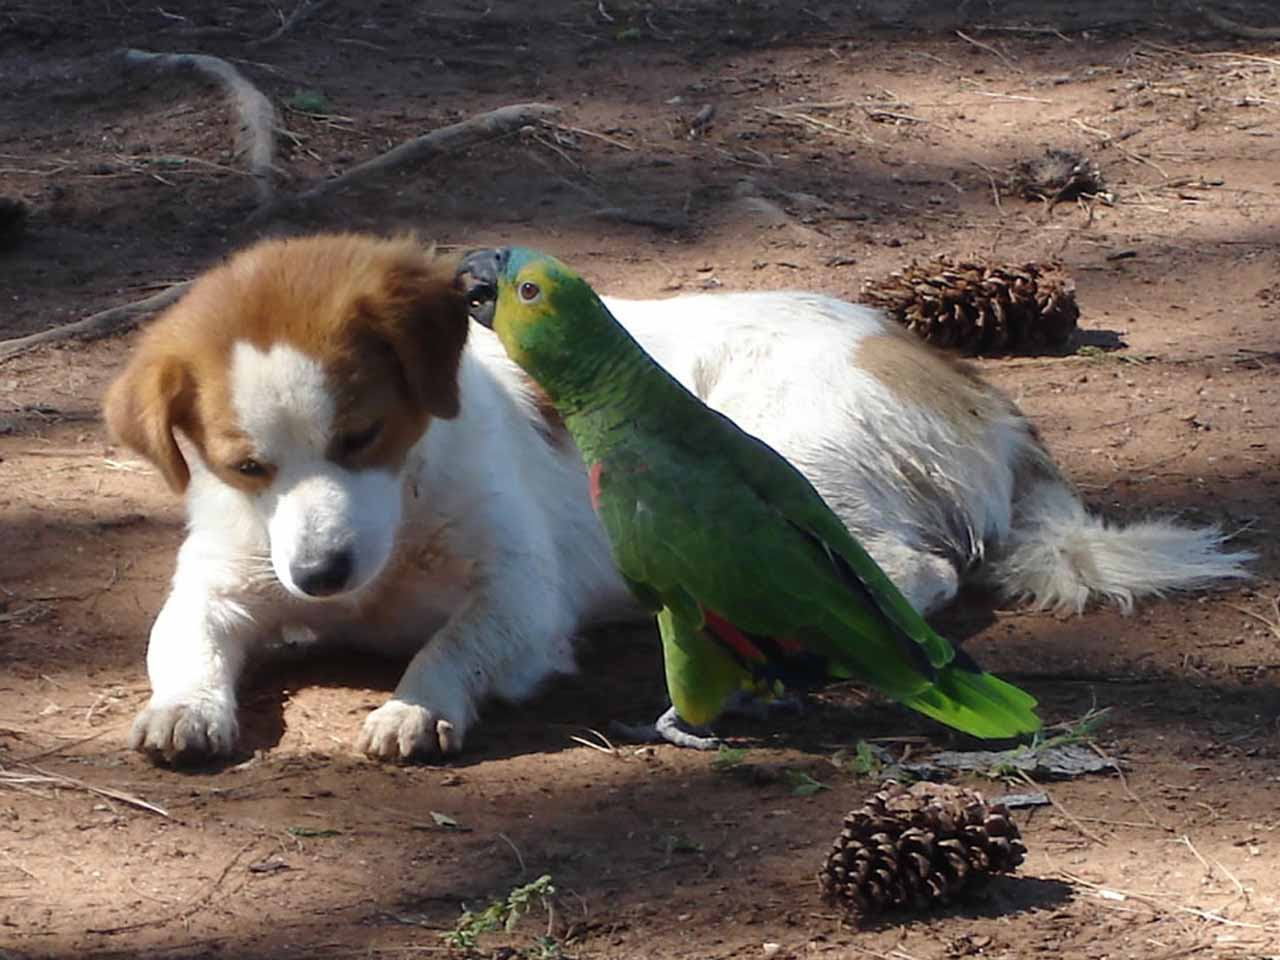 http://1.bp.blogspot.com/_bVhW0zm2jzo/SwbDrsWa7yI/AAAAAAAABOU/xEQ4yMqGhfg/s1600/cao-e-papagaio.jpg